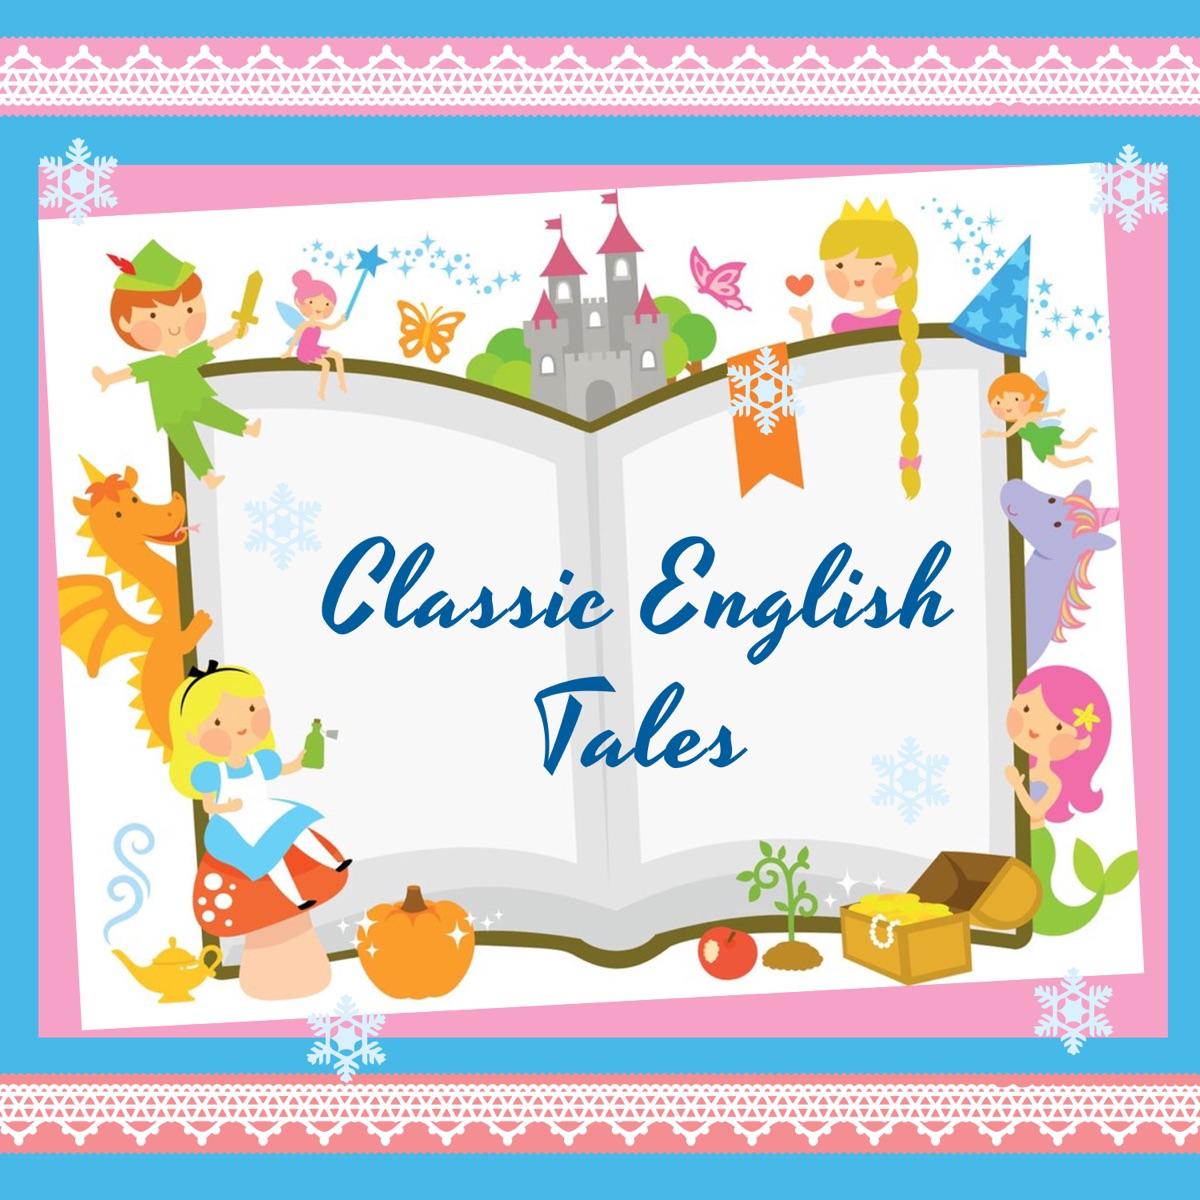 Classic English Tales